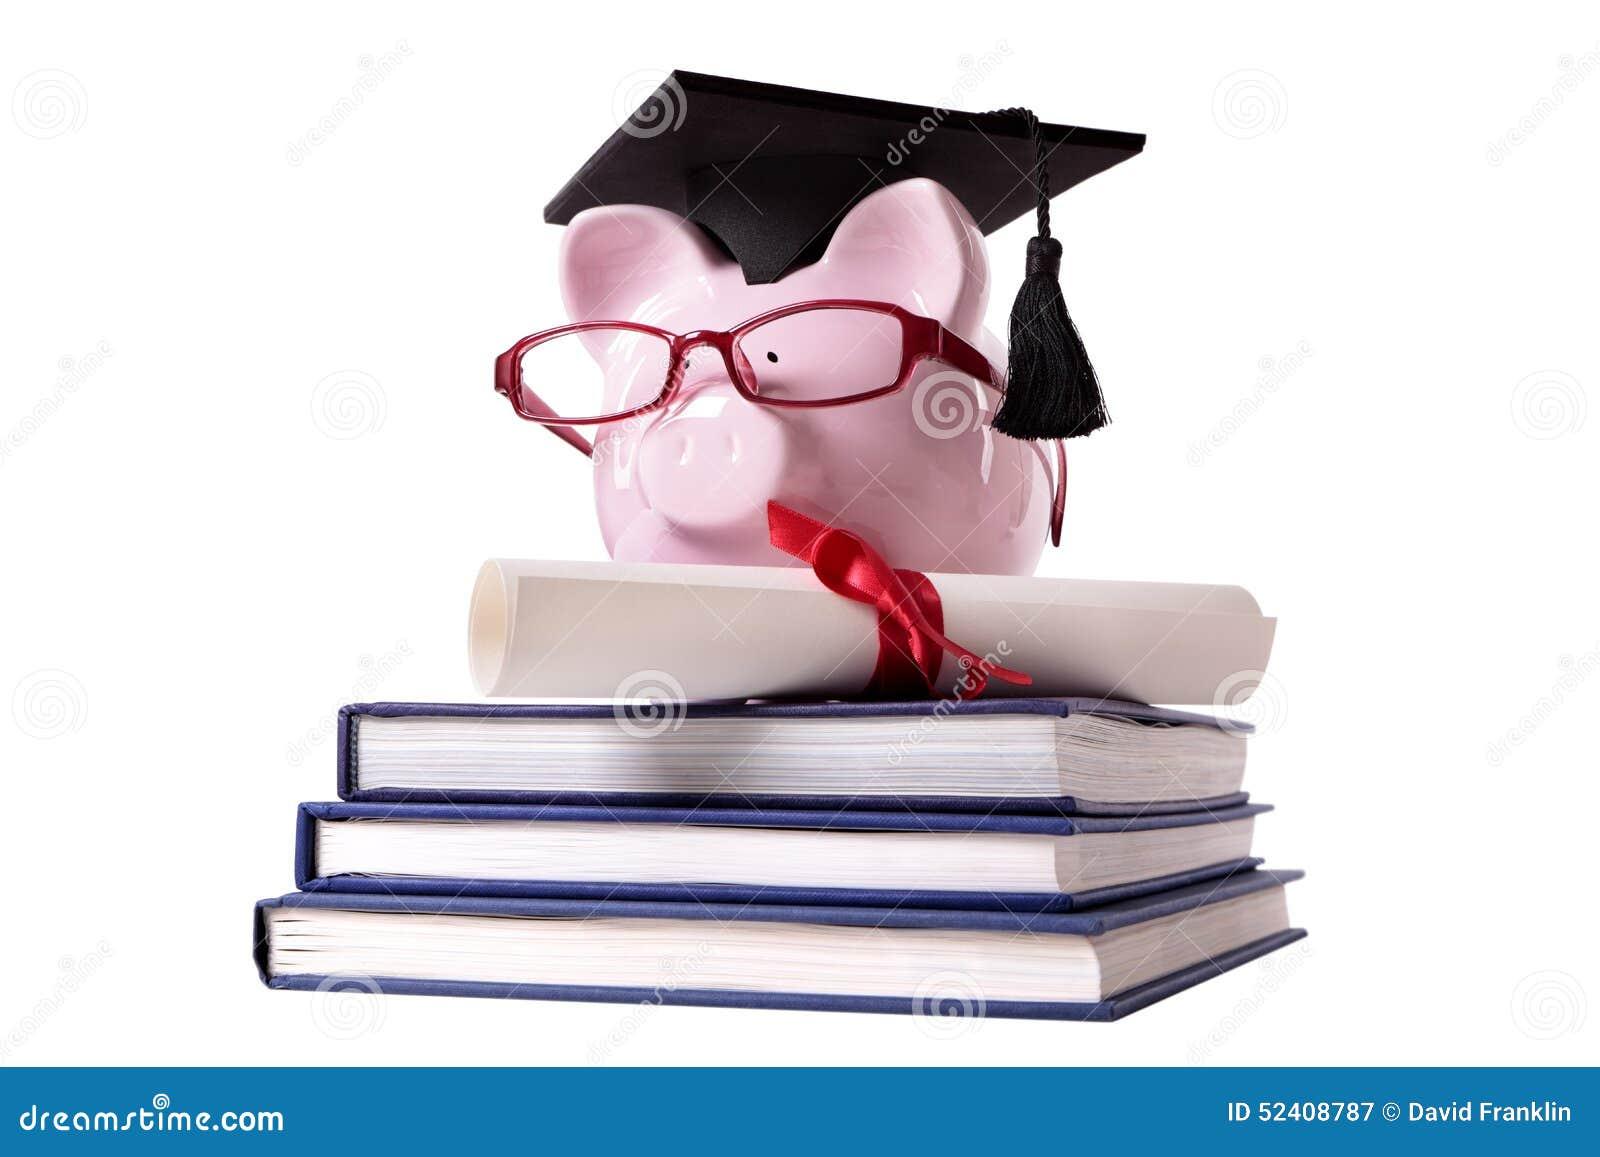 graduate piggy bank student collage graduation diploma stock image  graduate piggy bank student collage graduation diploma